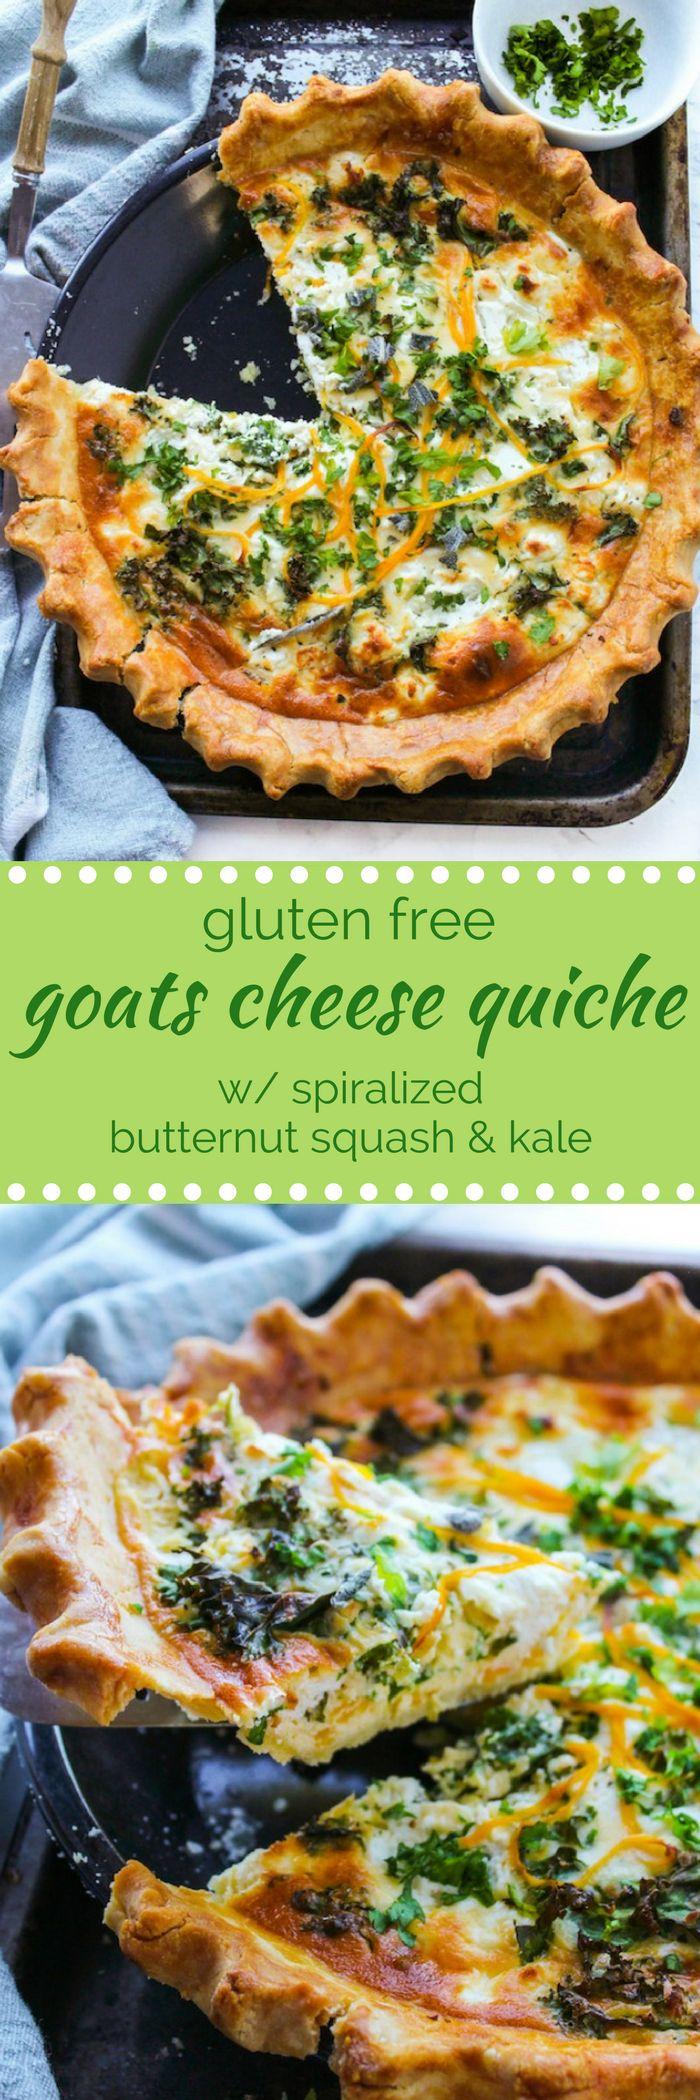 Blue apron quiche artichoke - Gluten Free Butternut Squash Kale Goats Cheese Quiche